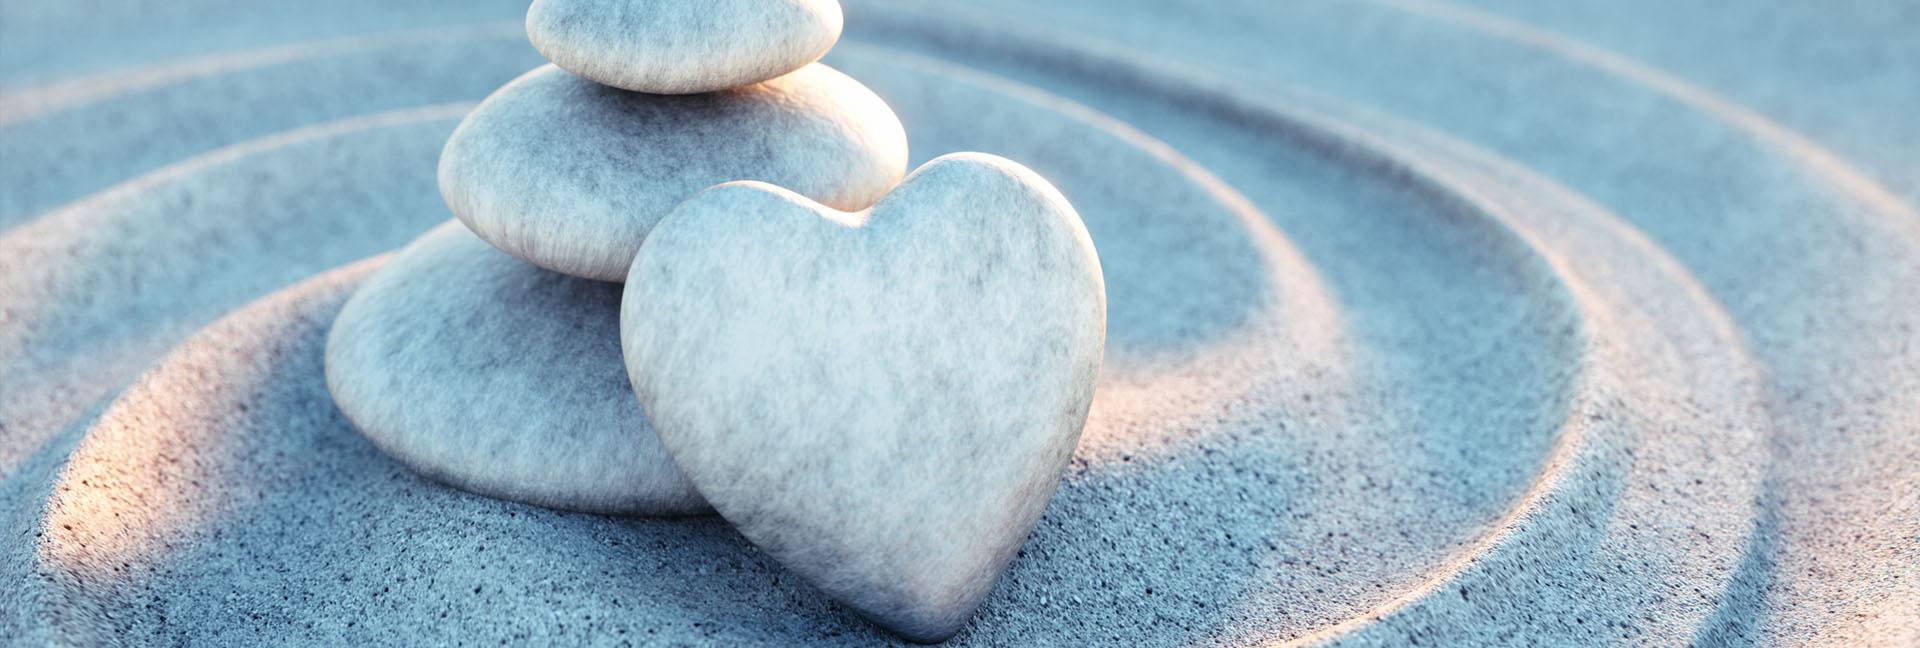 Autogenes Training, Entspannung, Zen